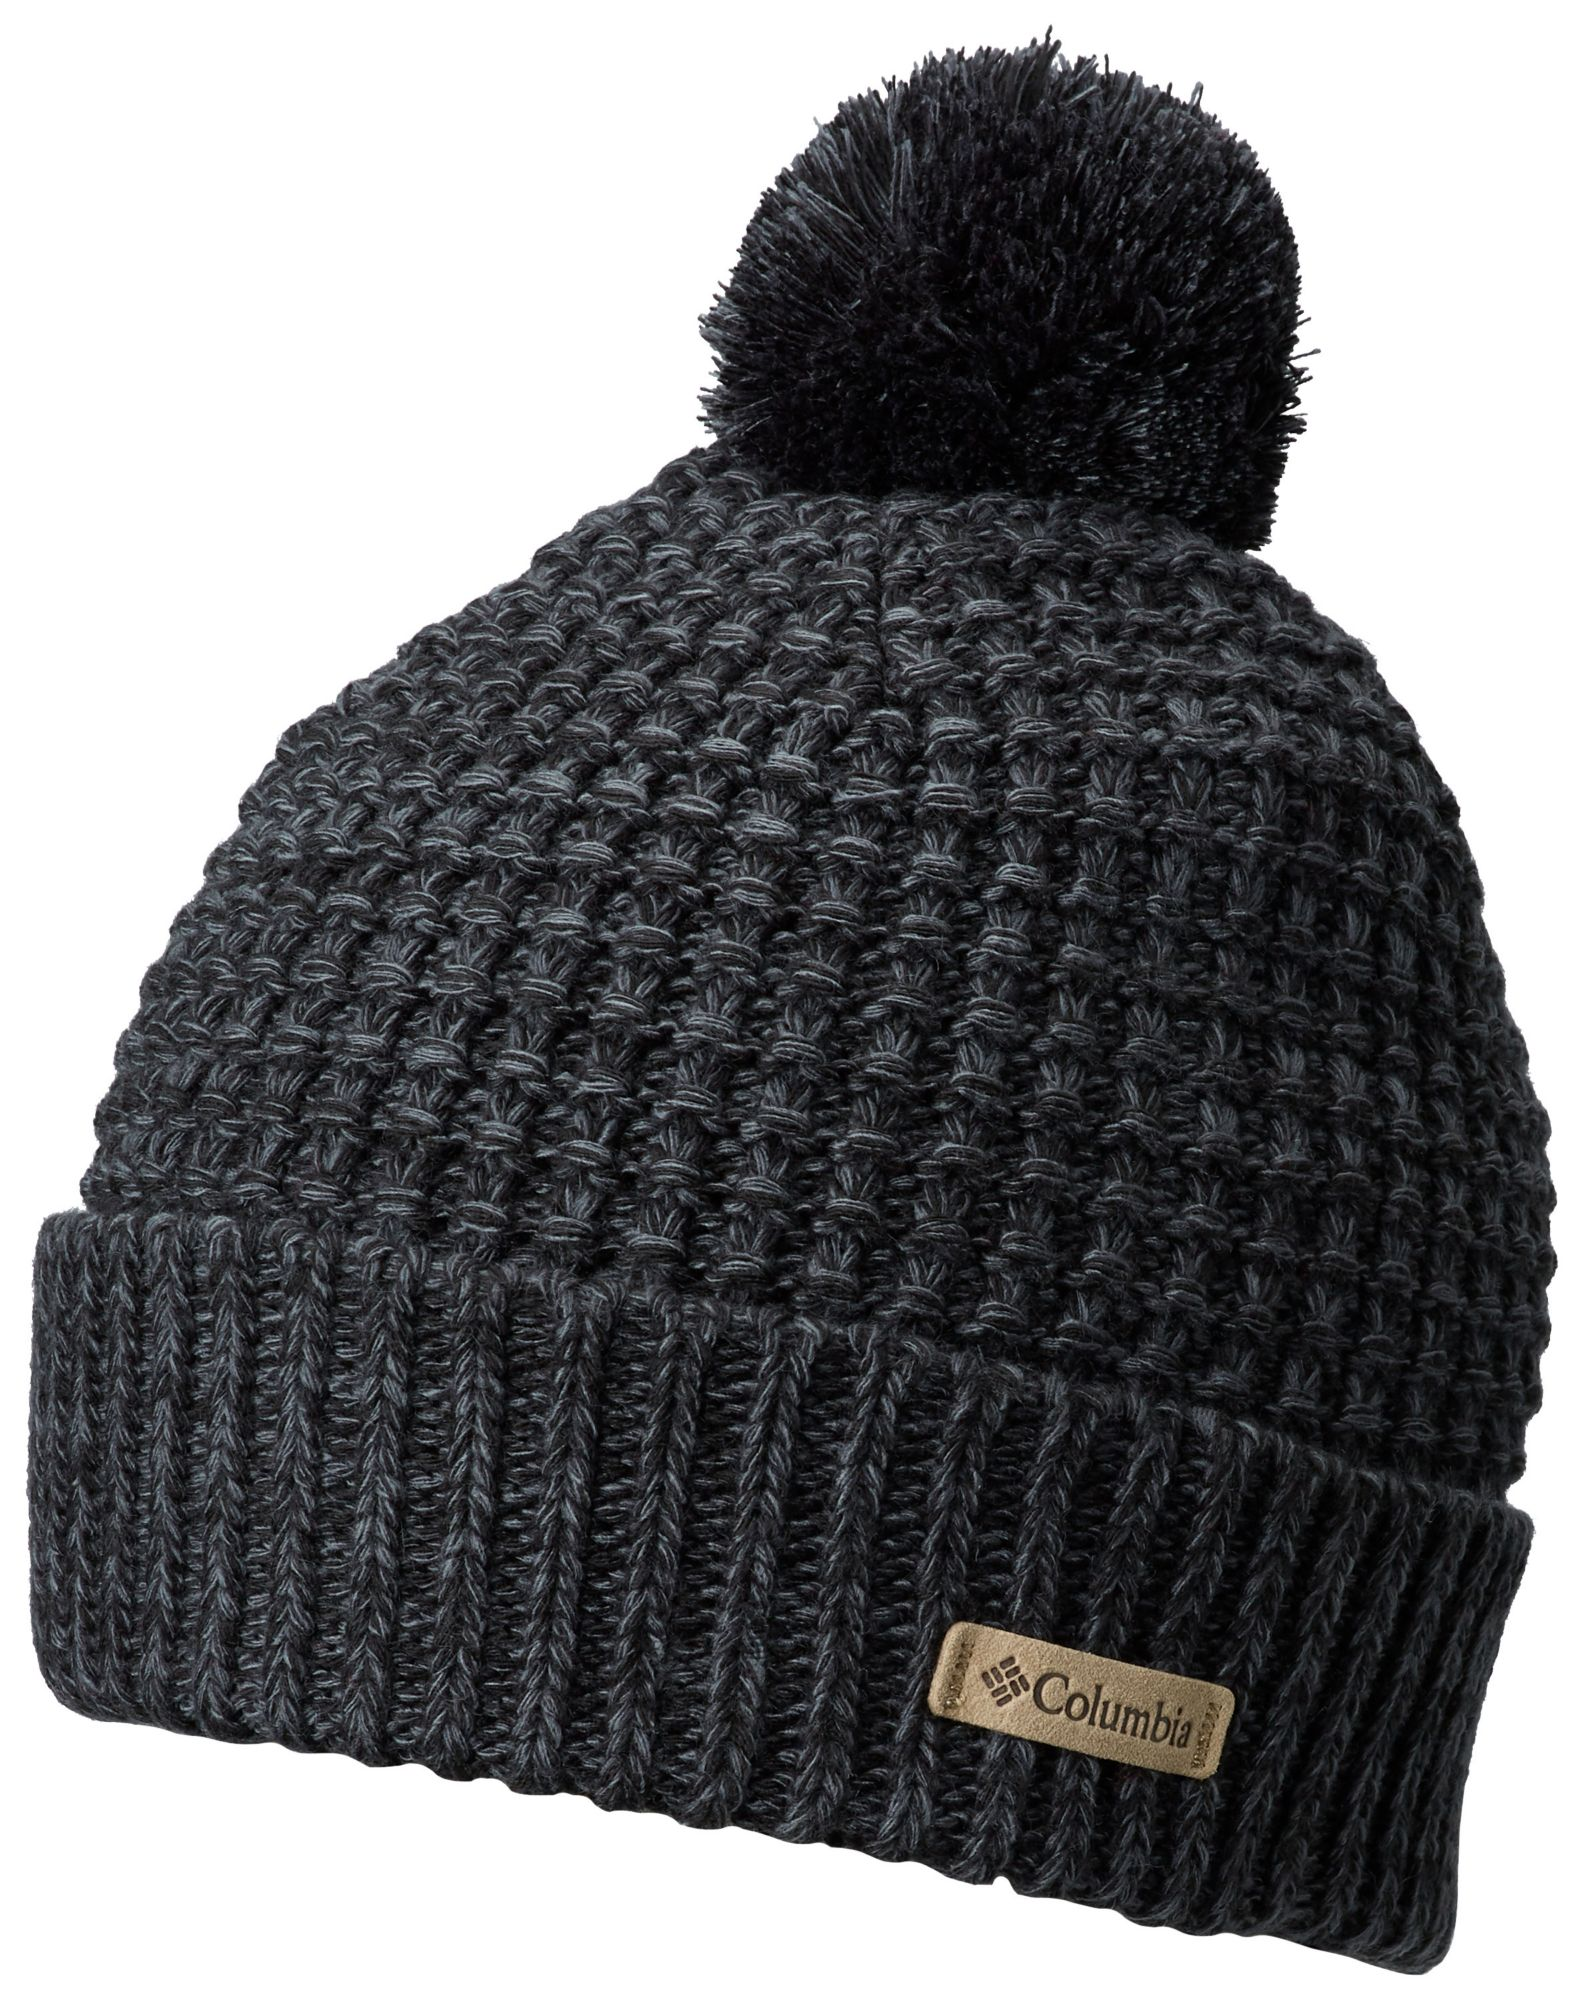 15CMBWWMGHTYLTWTCAOA Black Graphite is - Winter hats